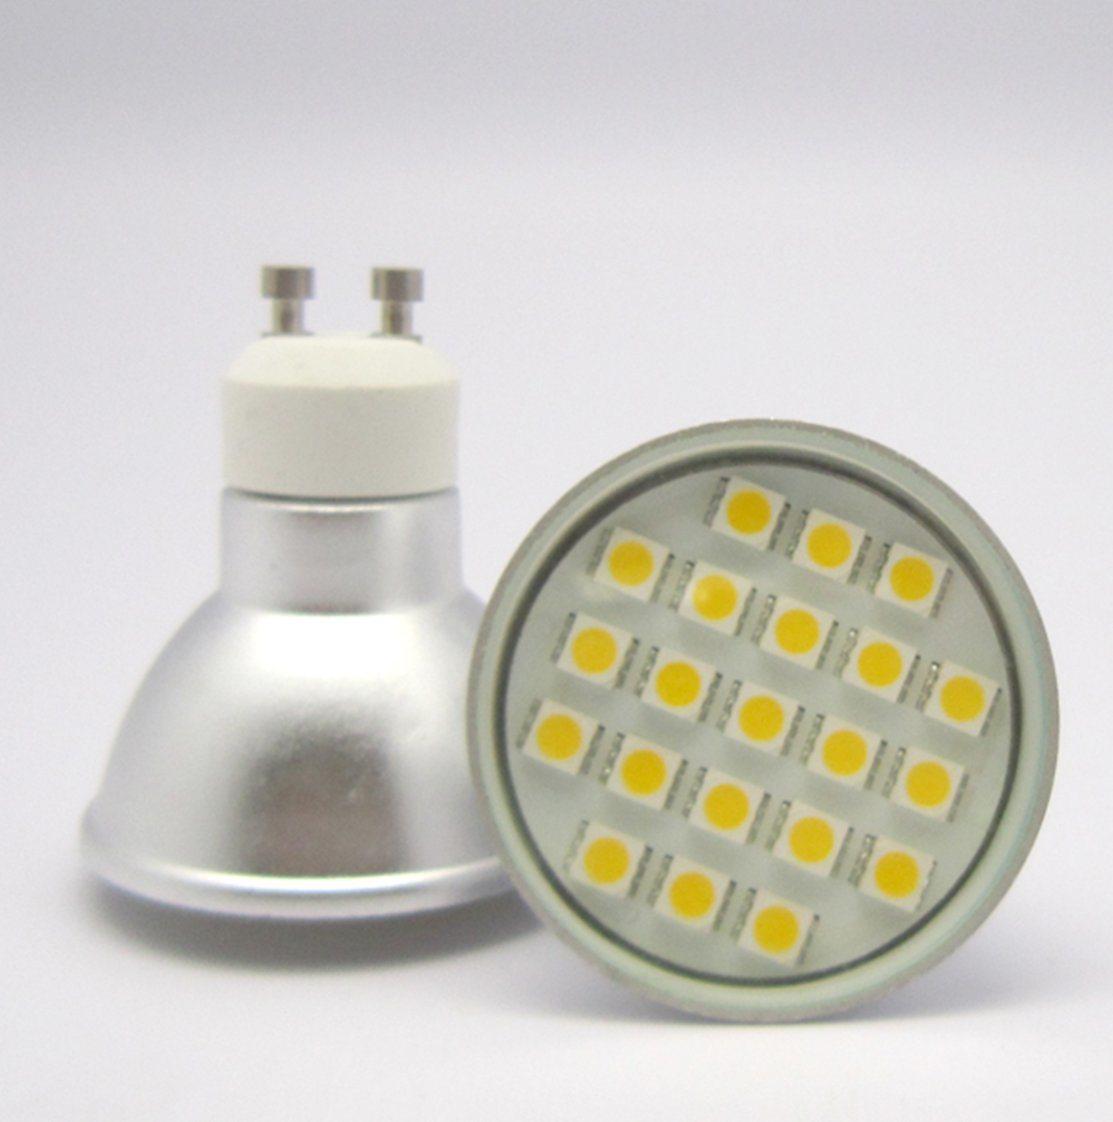 5050 21PCS 3W GU10 AC85-265V/12V LED Spotlight